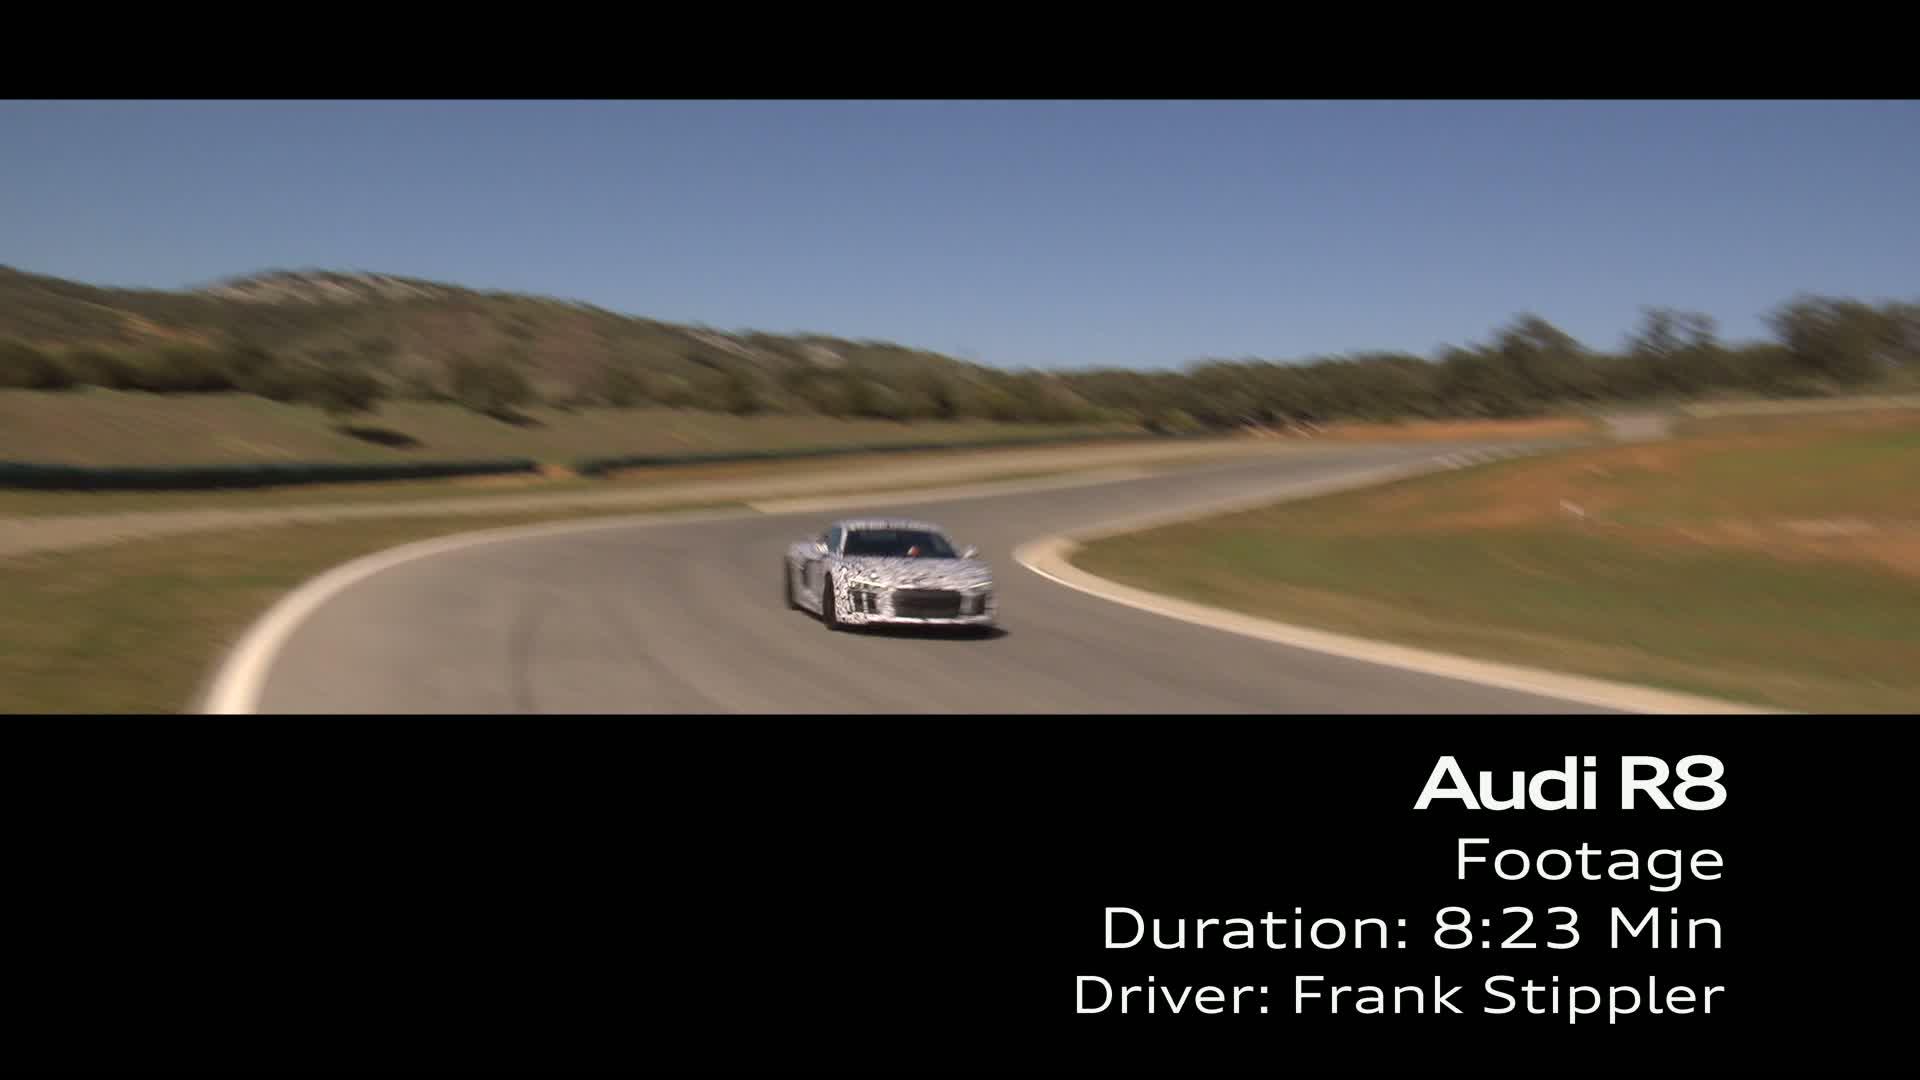 Audi R8 Prototype Test Drive - Footage